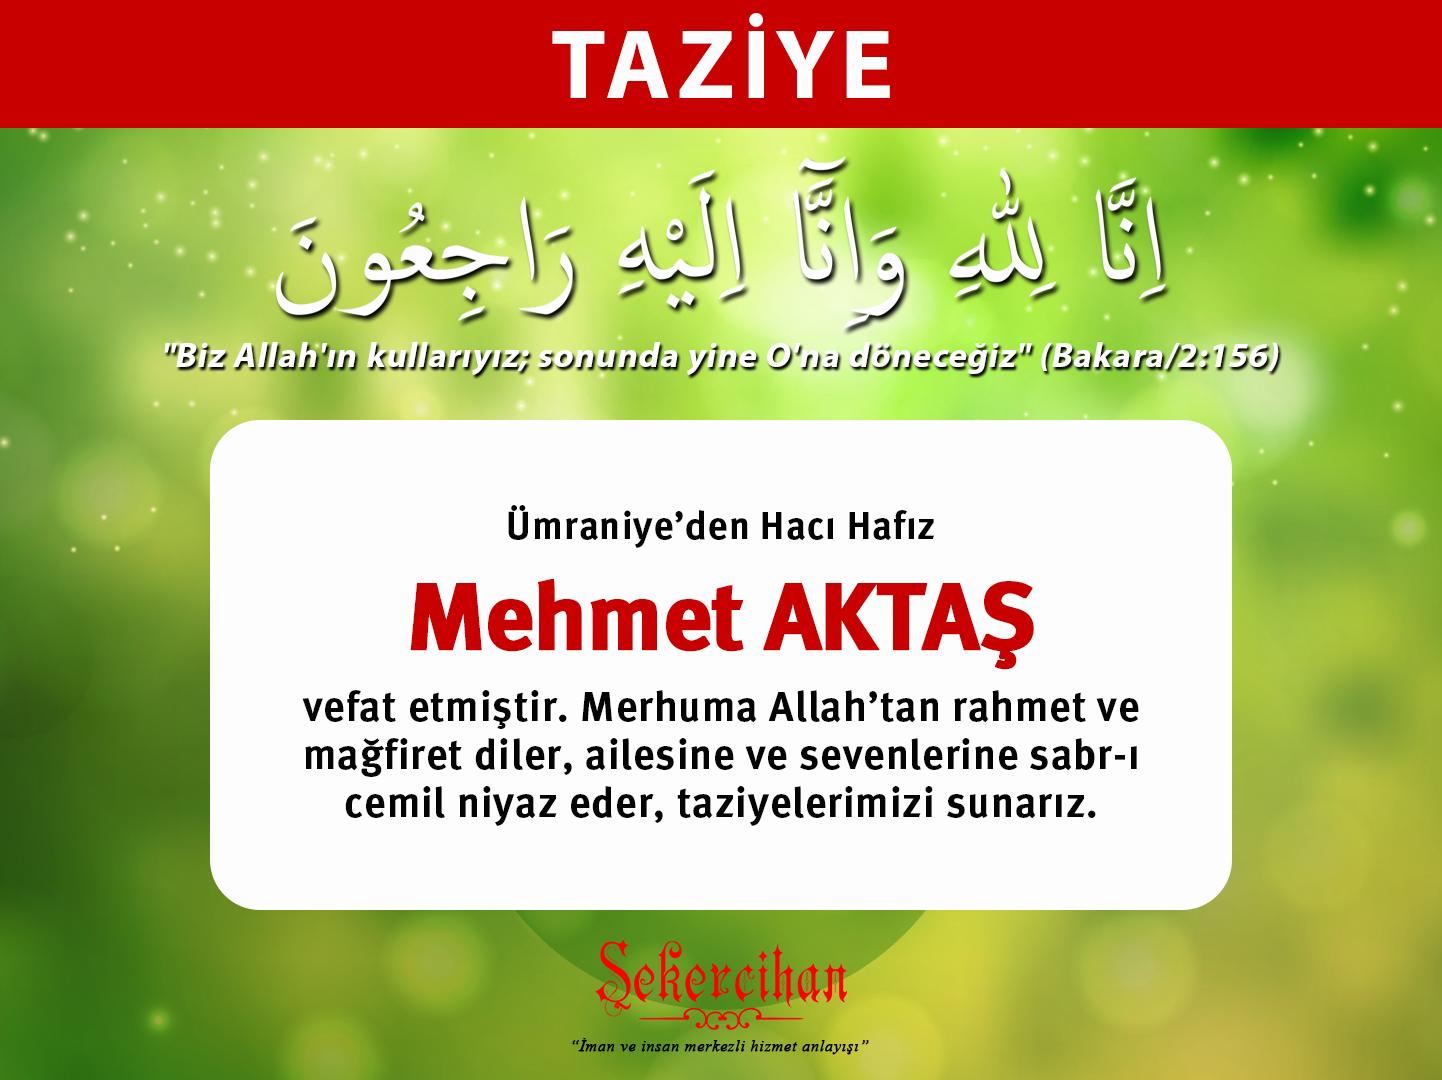 Taziye Mehmet Aktaş